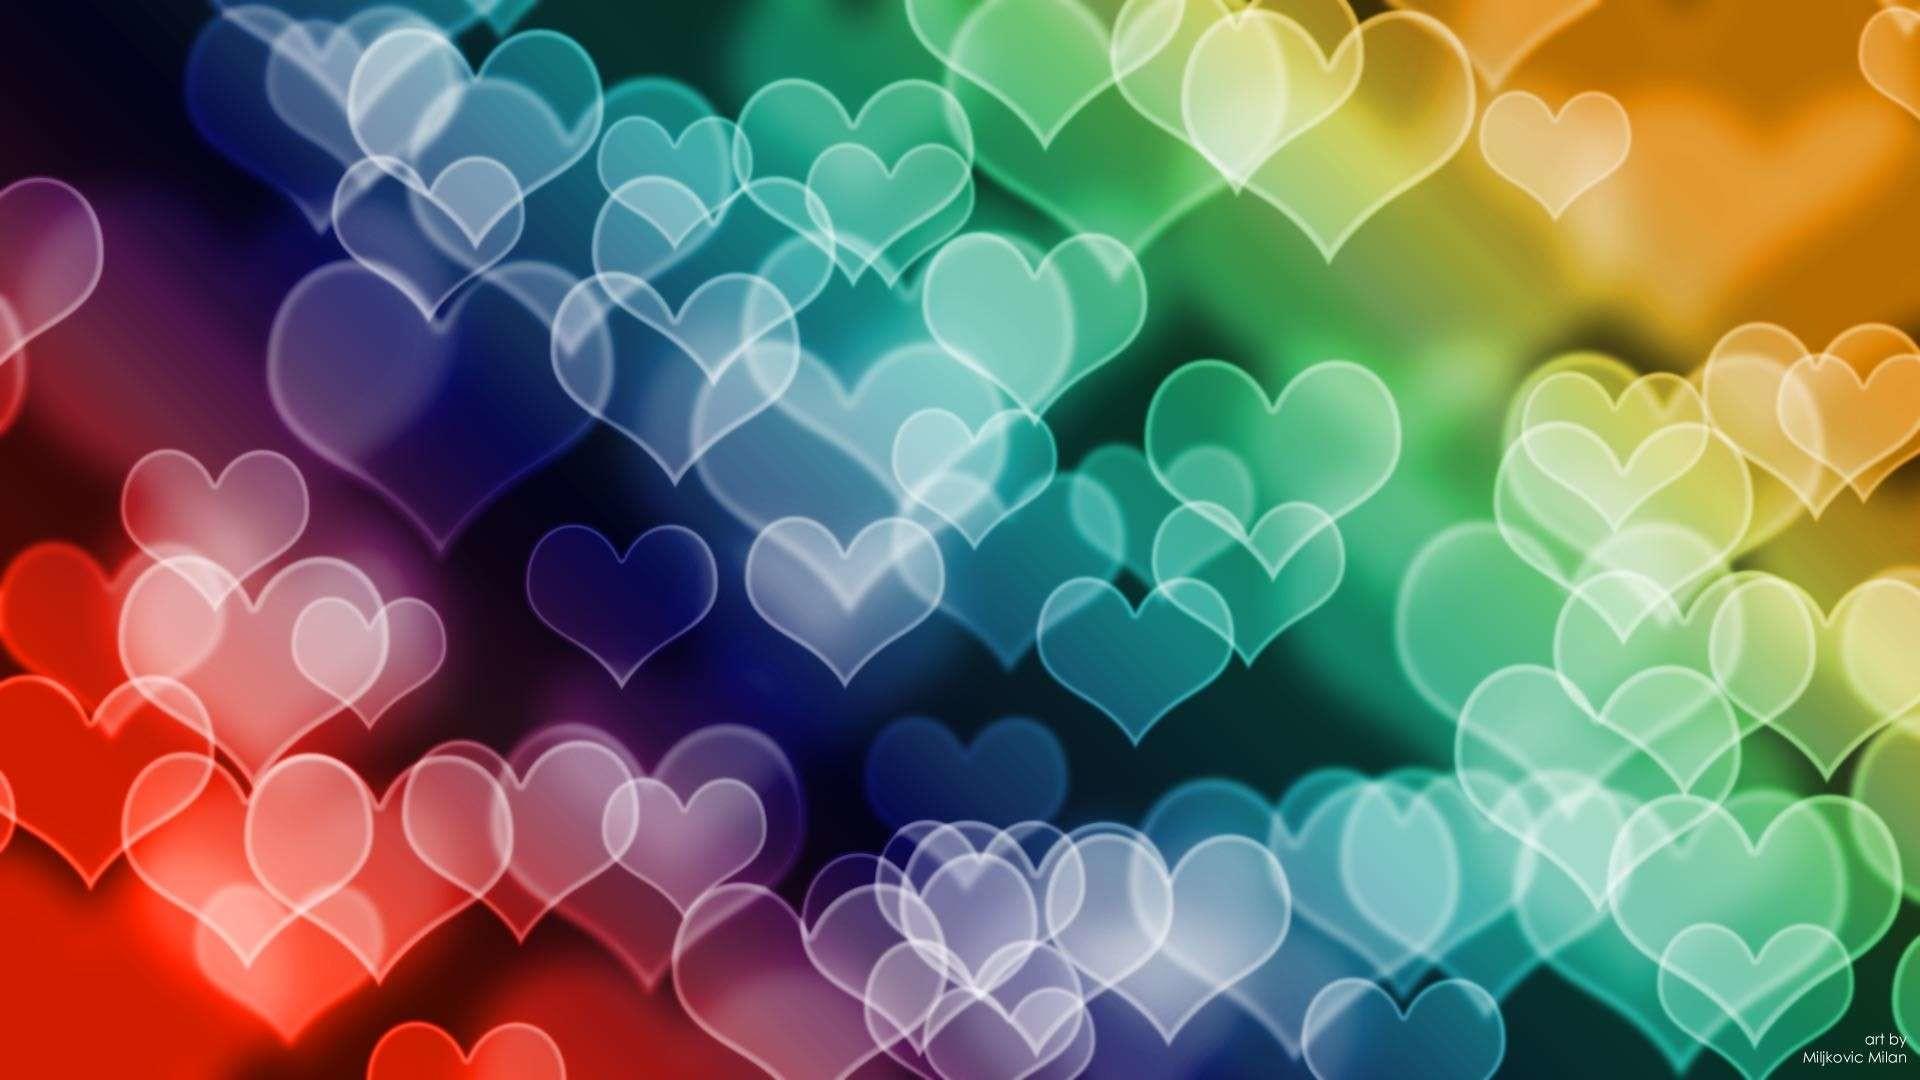 blue hearts wallpaper 61 images